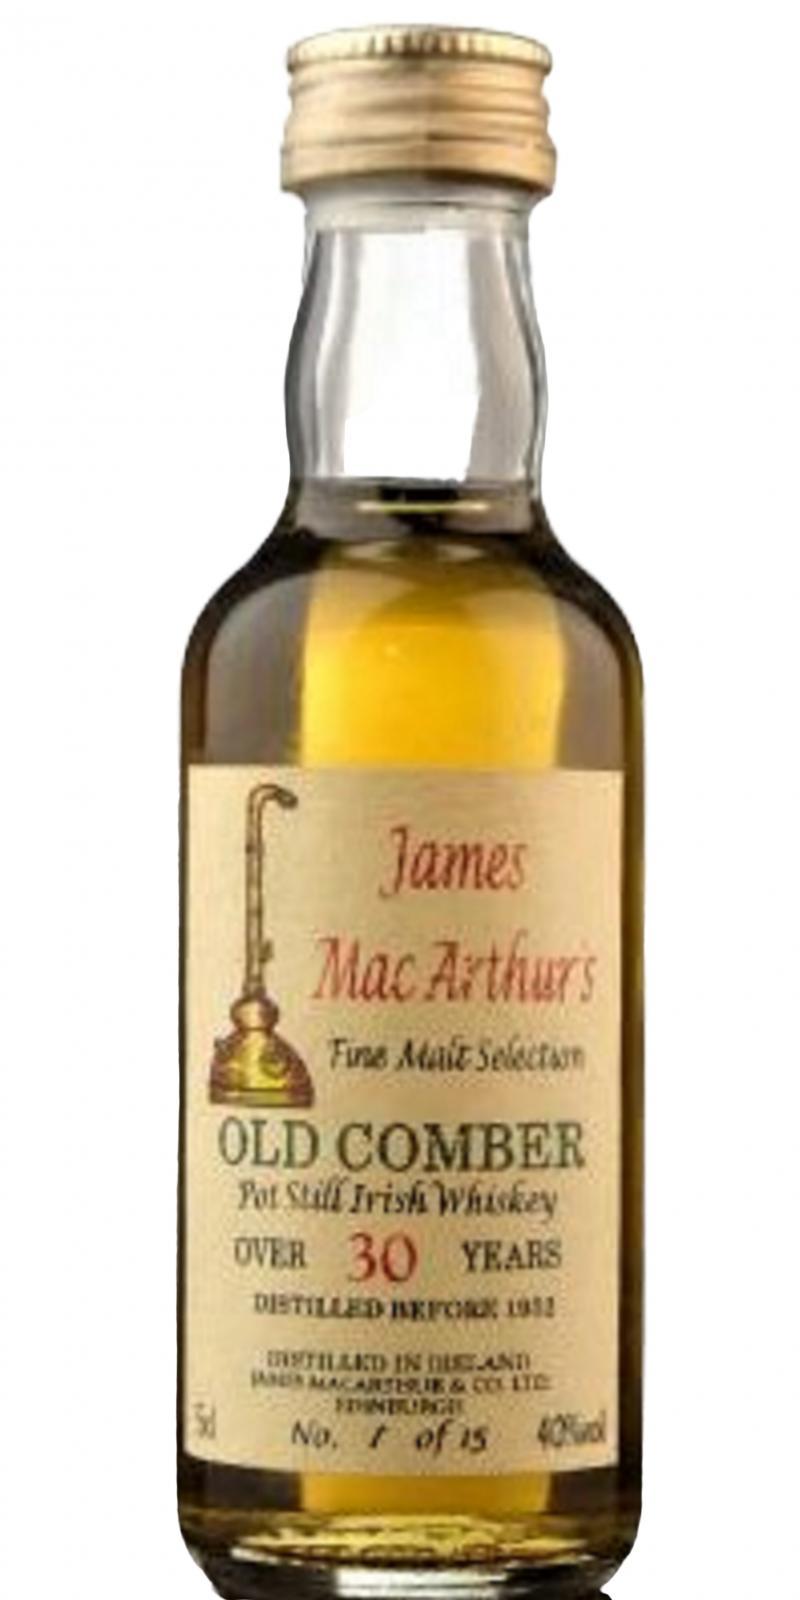 Old Comber 30-year-old JM